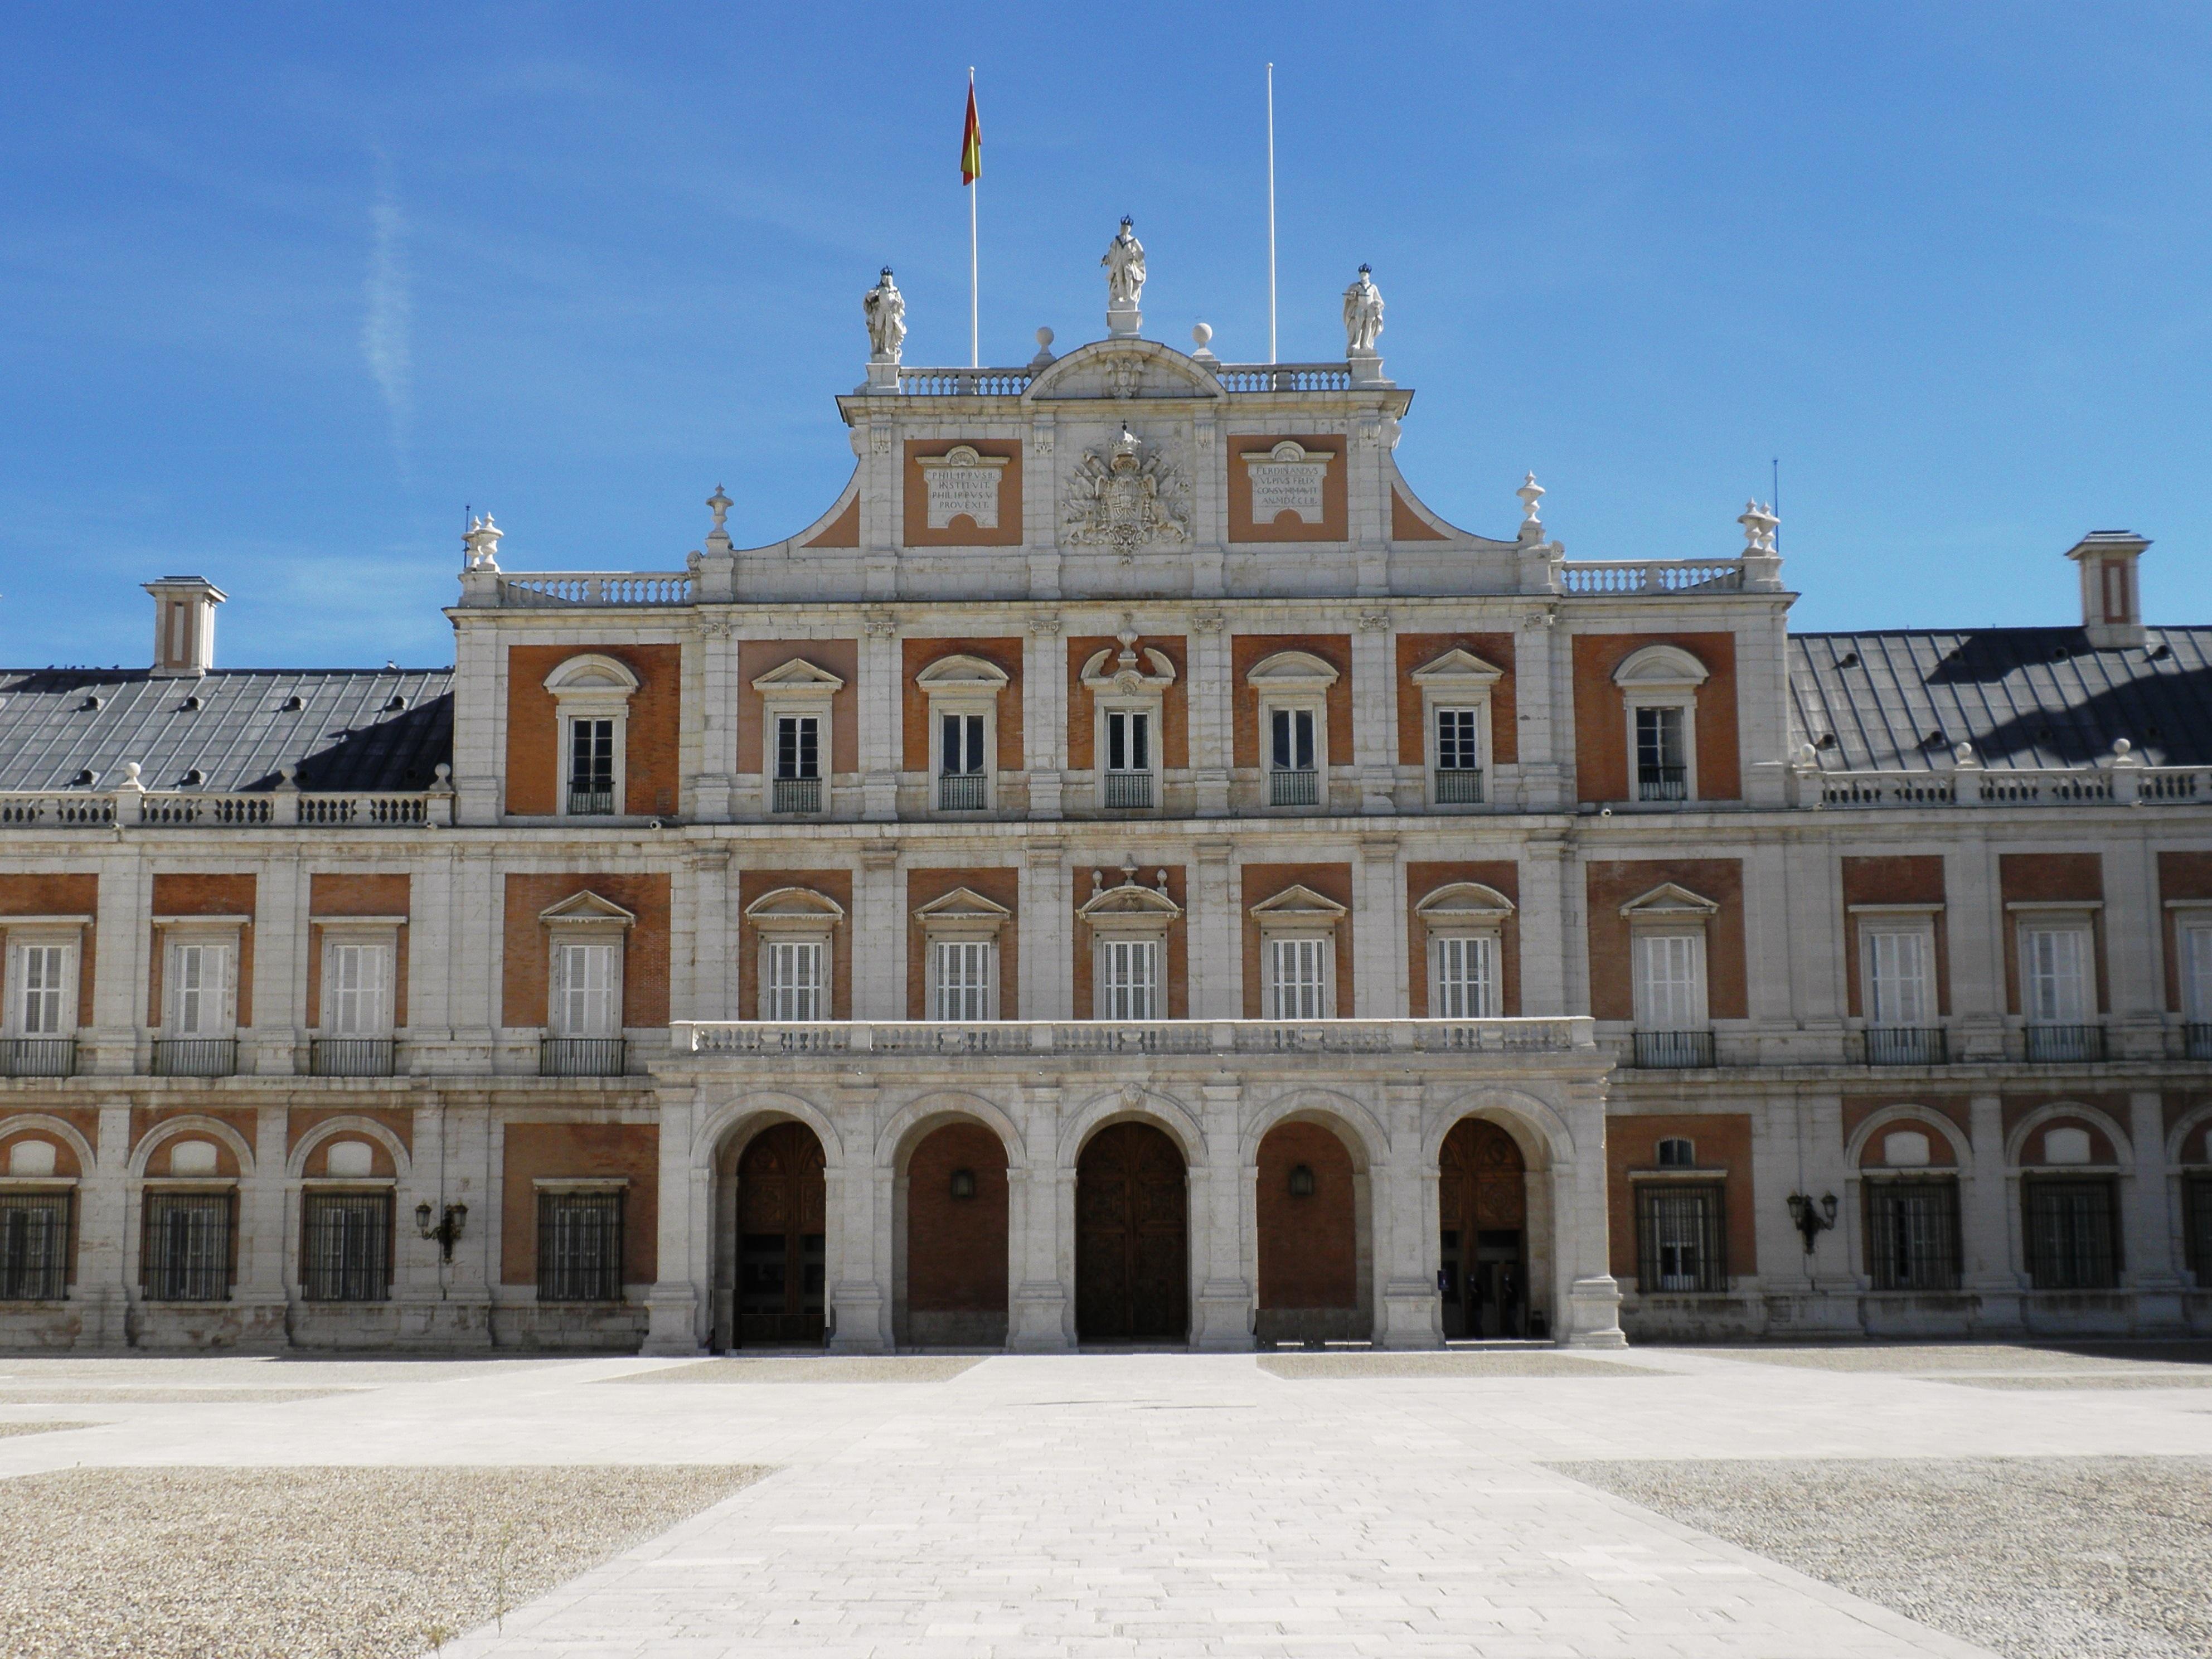 Royal Palace Of Aranjuez Backgrounds on Wallpapers Vista